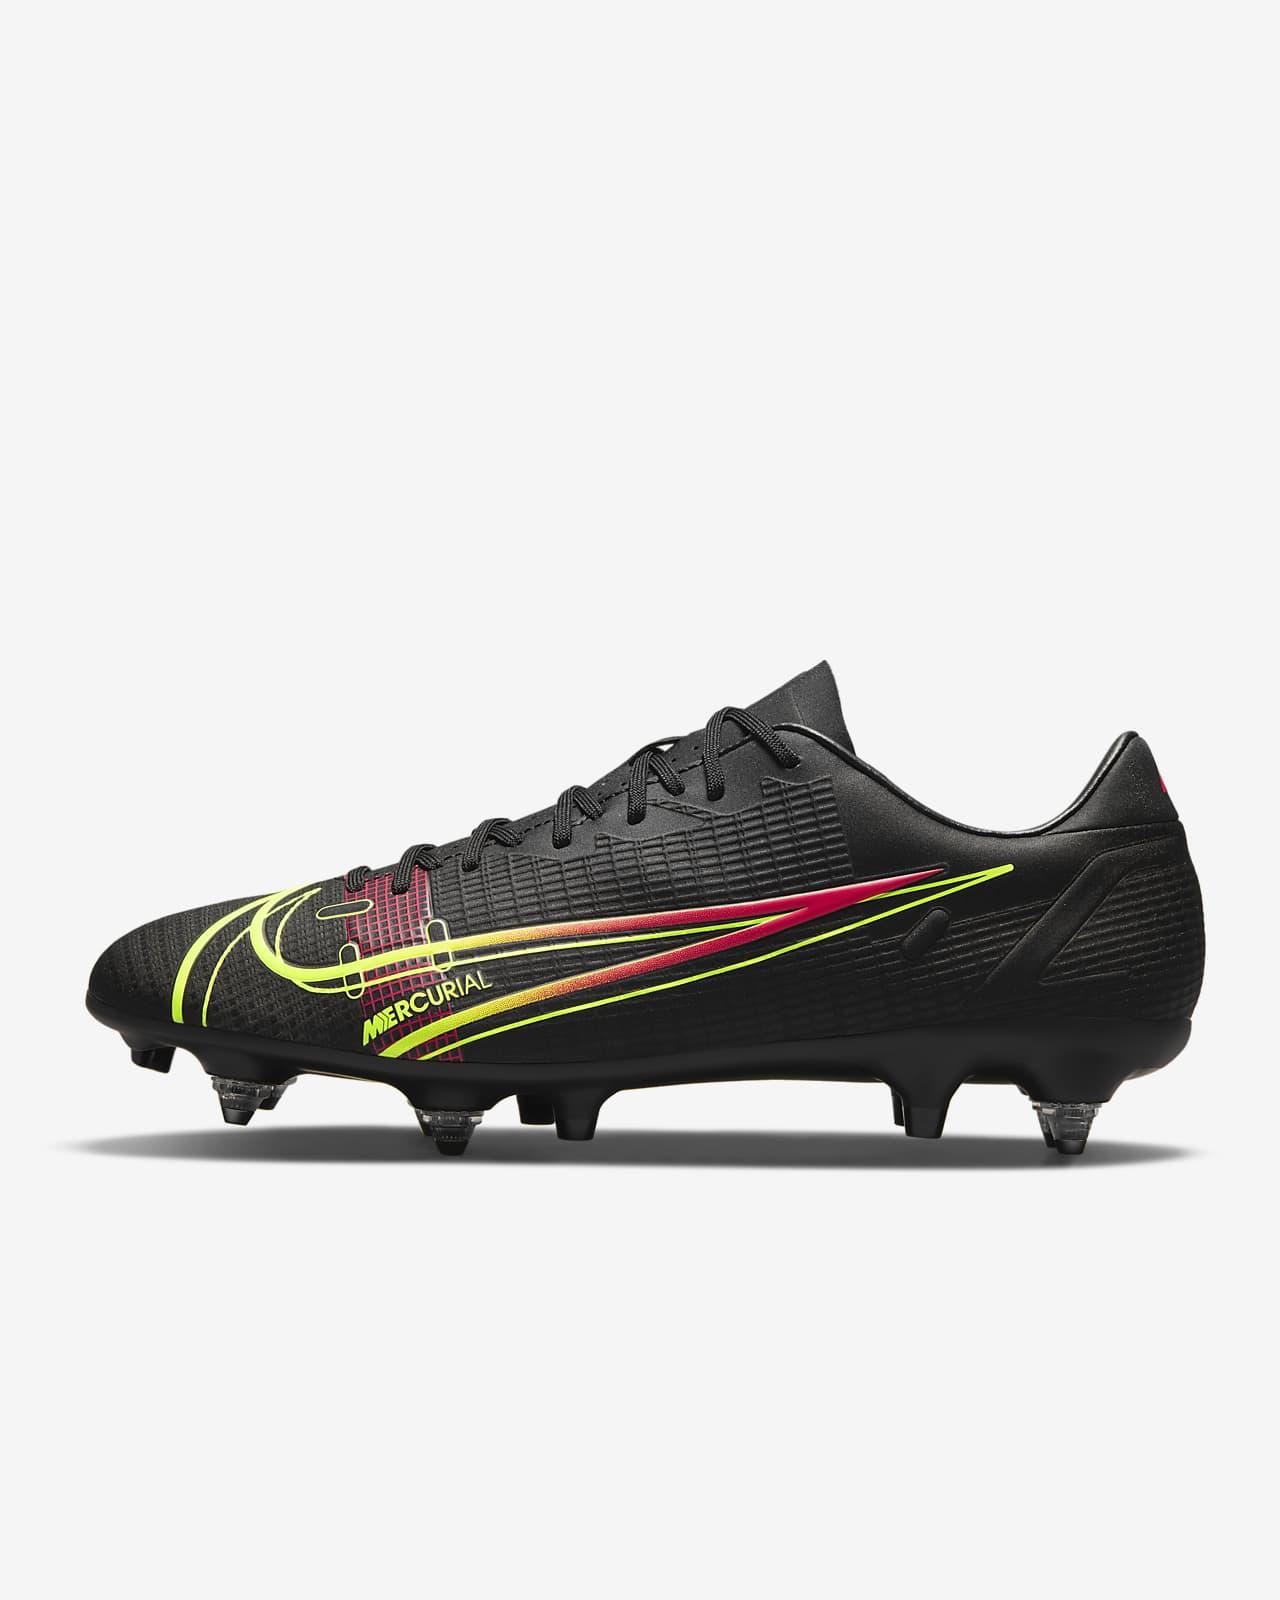 Chaussure de football à crampons pour terrain gras Nike Mercurial Vapor 14 Academy SG-Pro AC